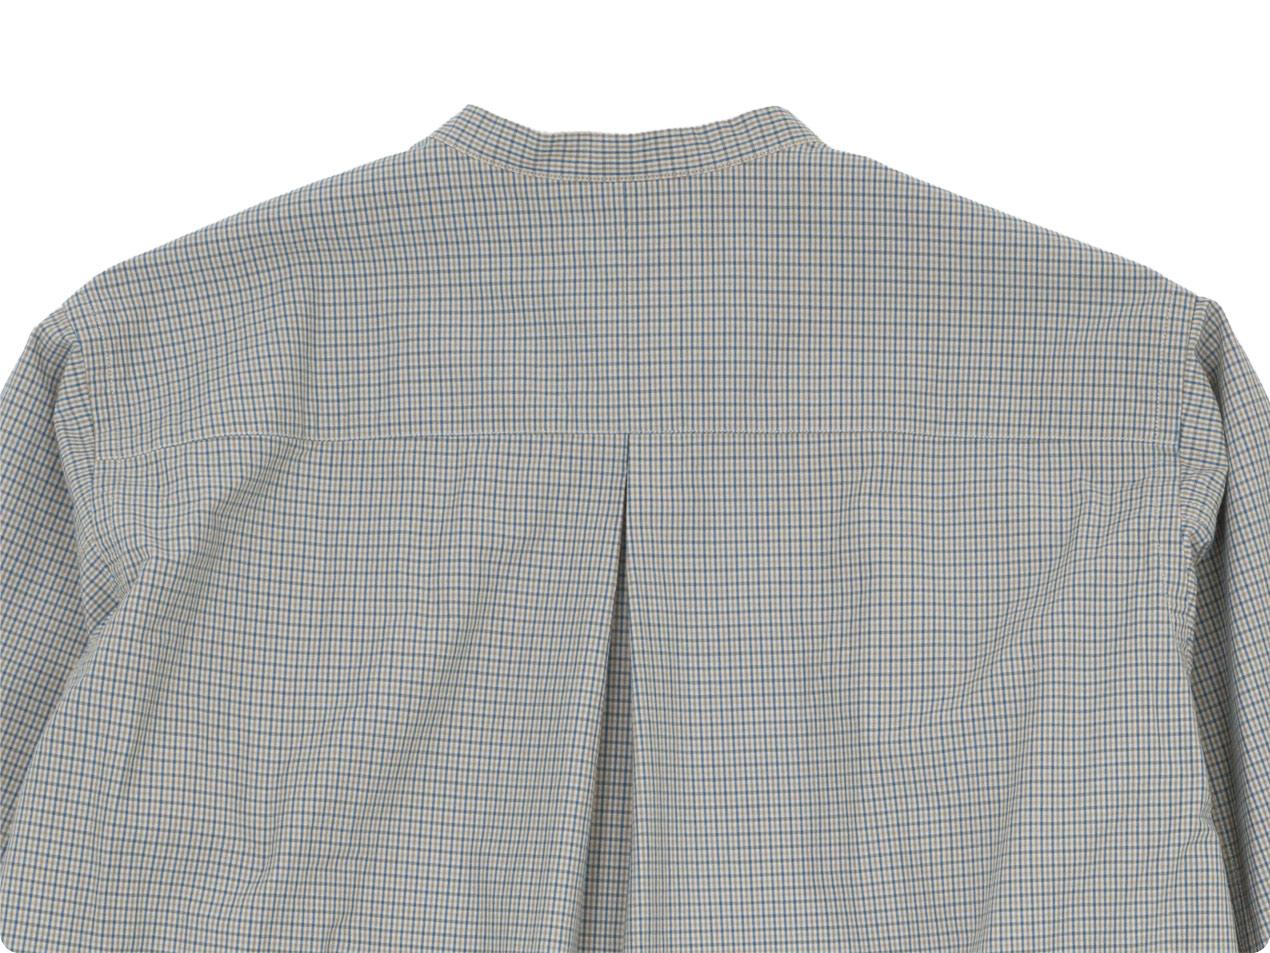 blanc no collar long shirts cotton